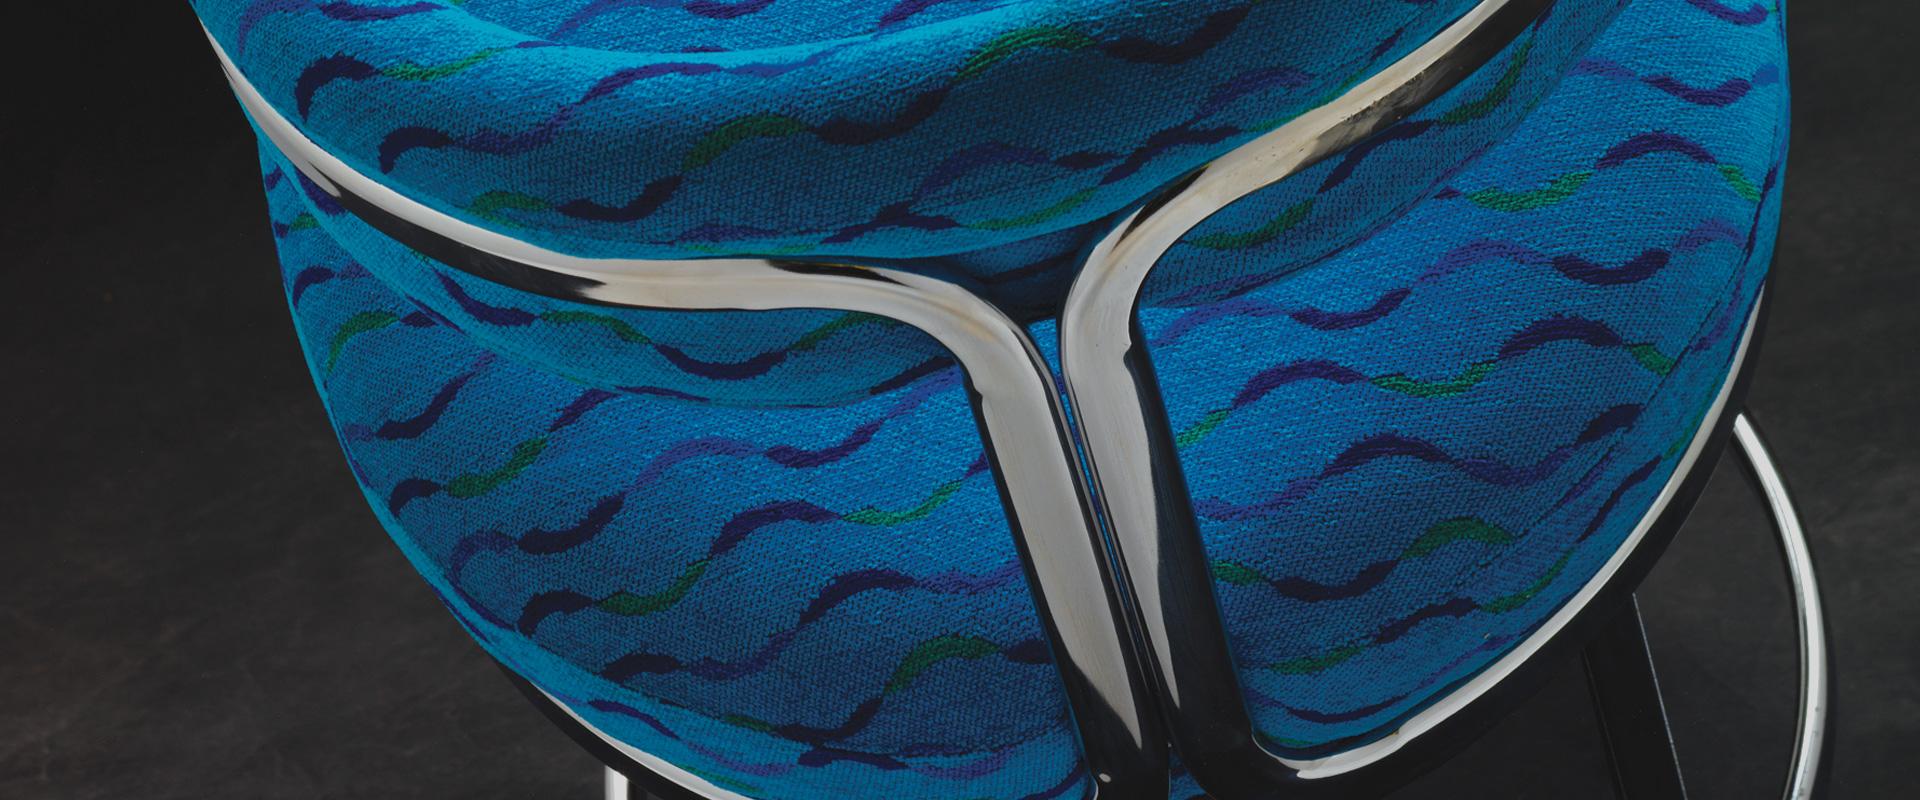 Design Trac X-10 Series